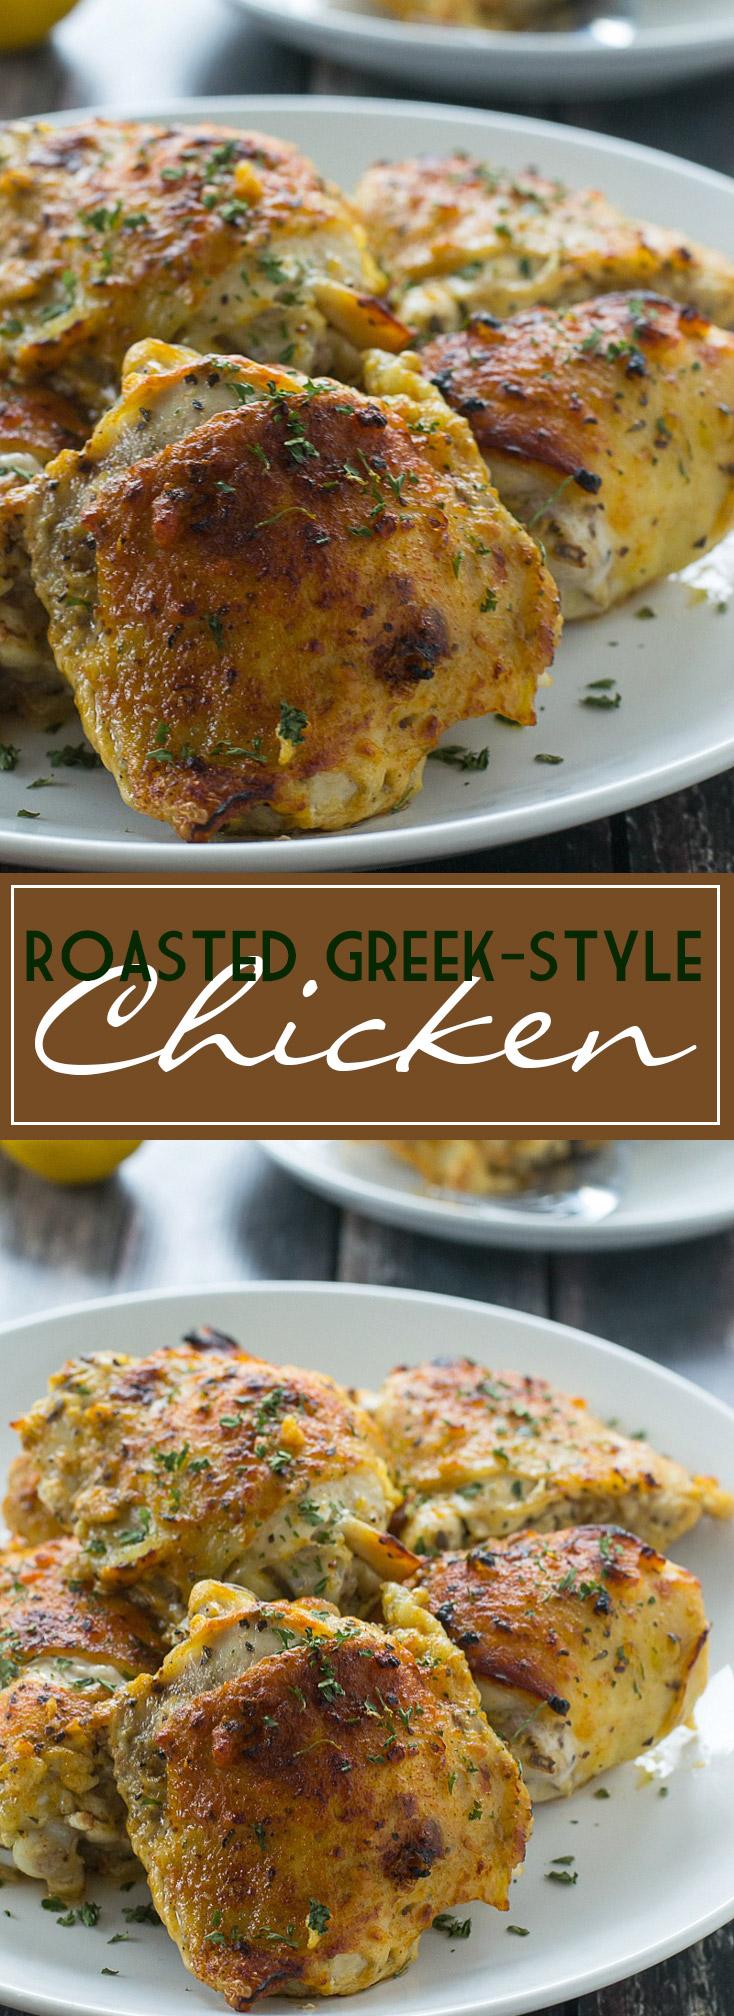 Roasted Greek-Style Chicken | www.motherthyme.com